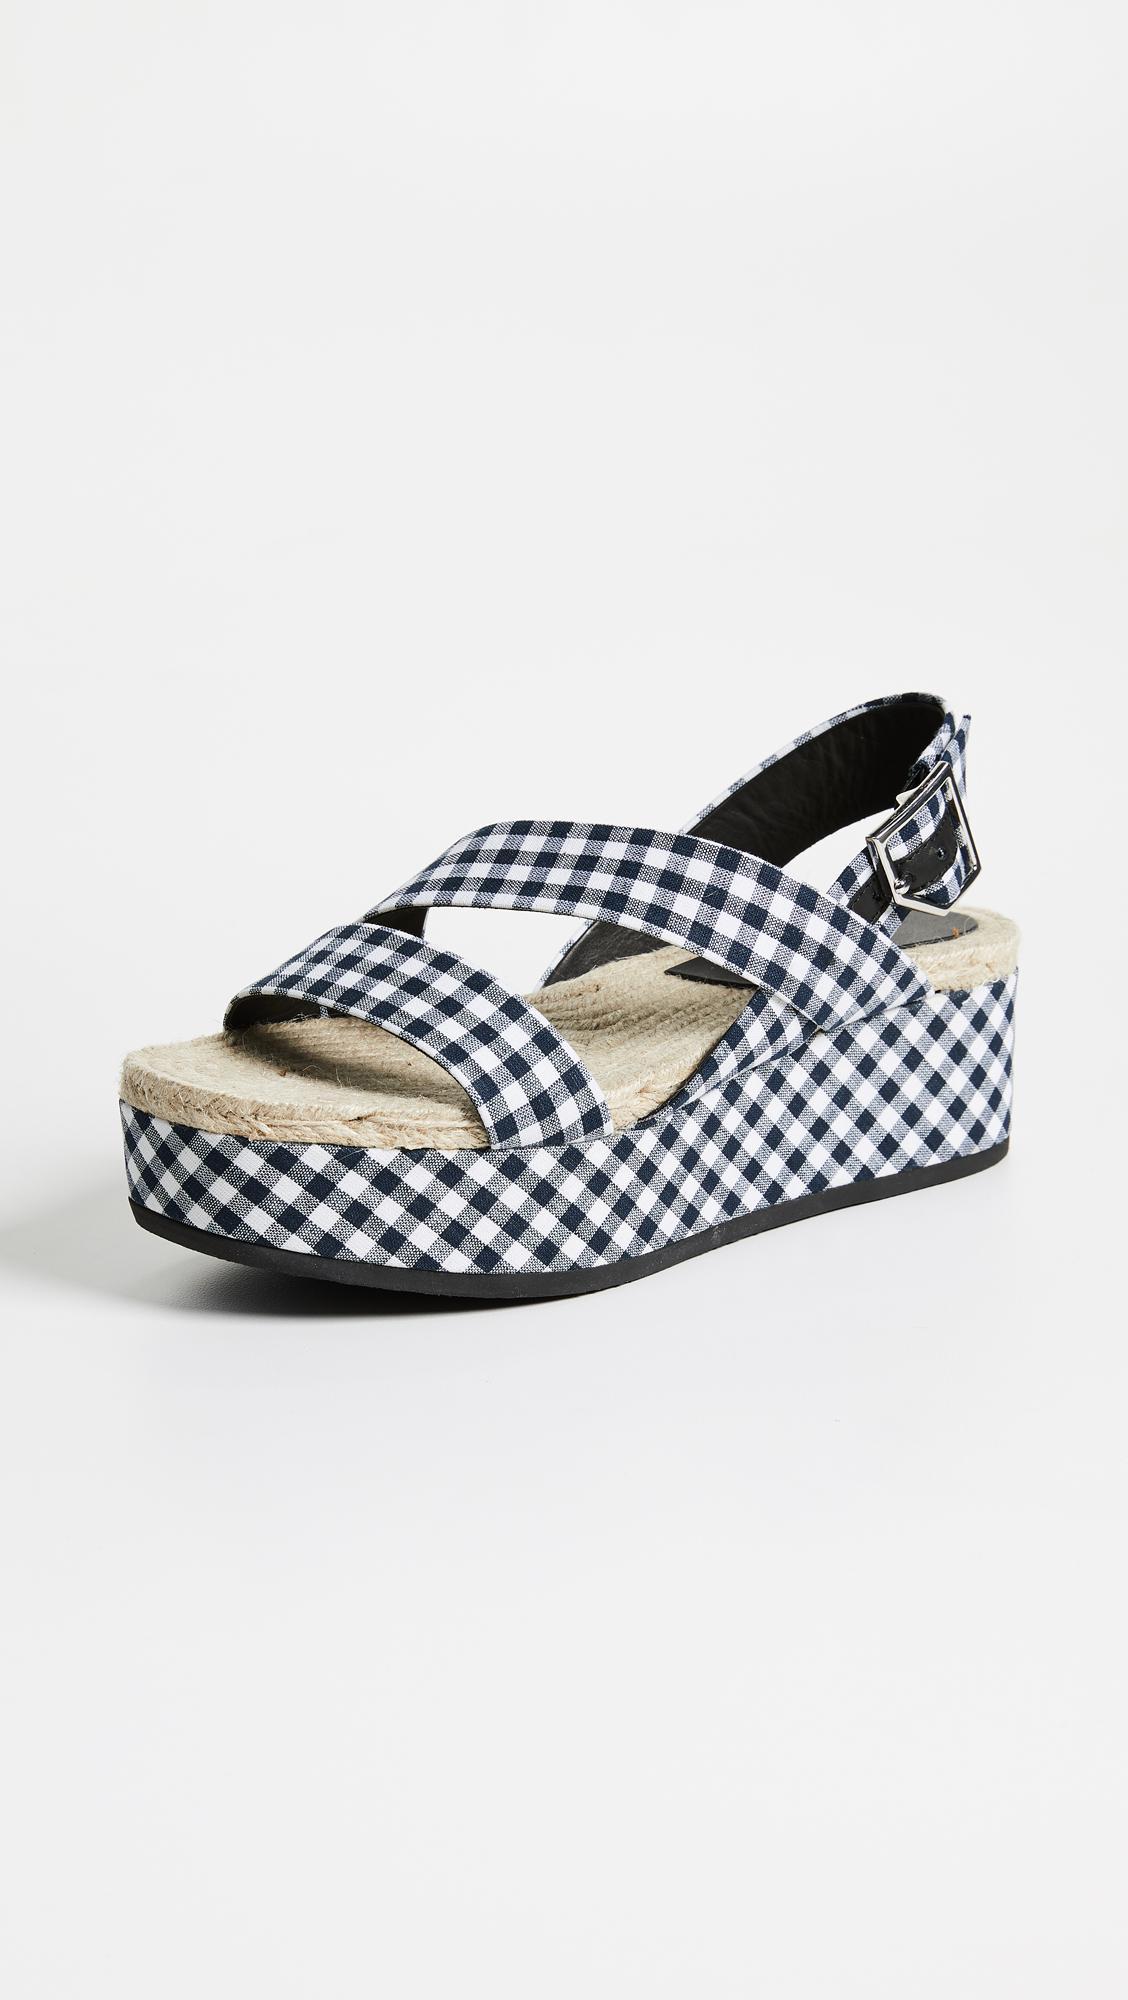 Sandales Plate-forme Megan Vichy Rag & Bone 3xwXrQdgQJ